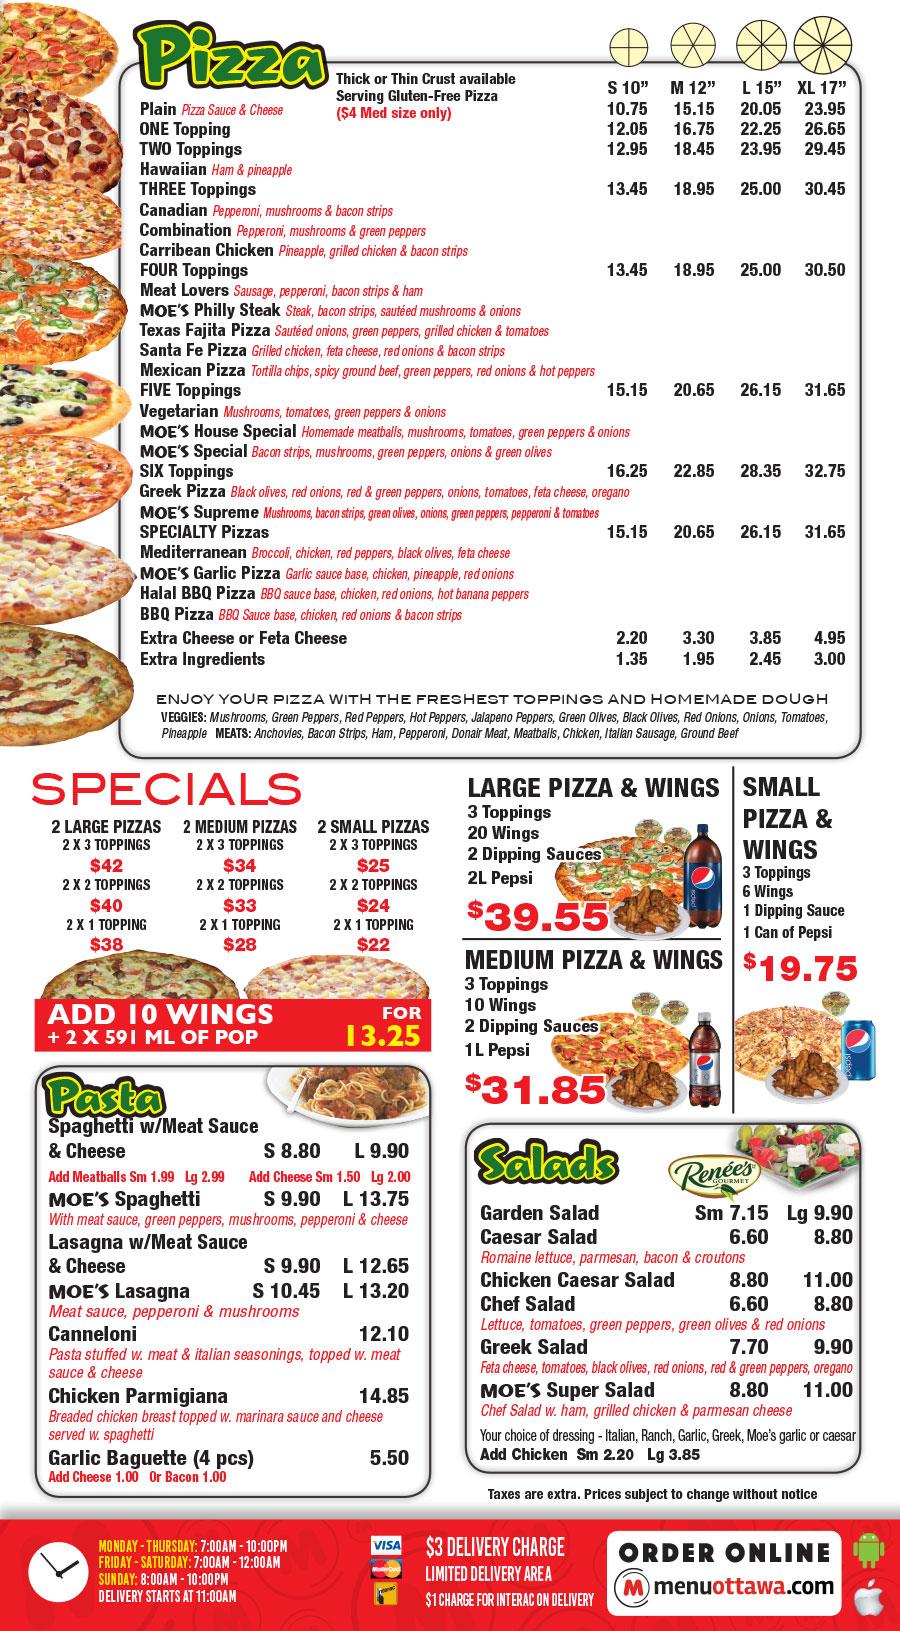 Moe's Famous Pizza - 102B McEwen Ave Order Online!